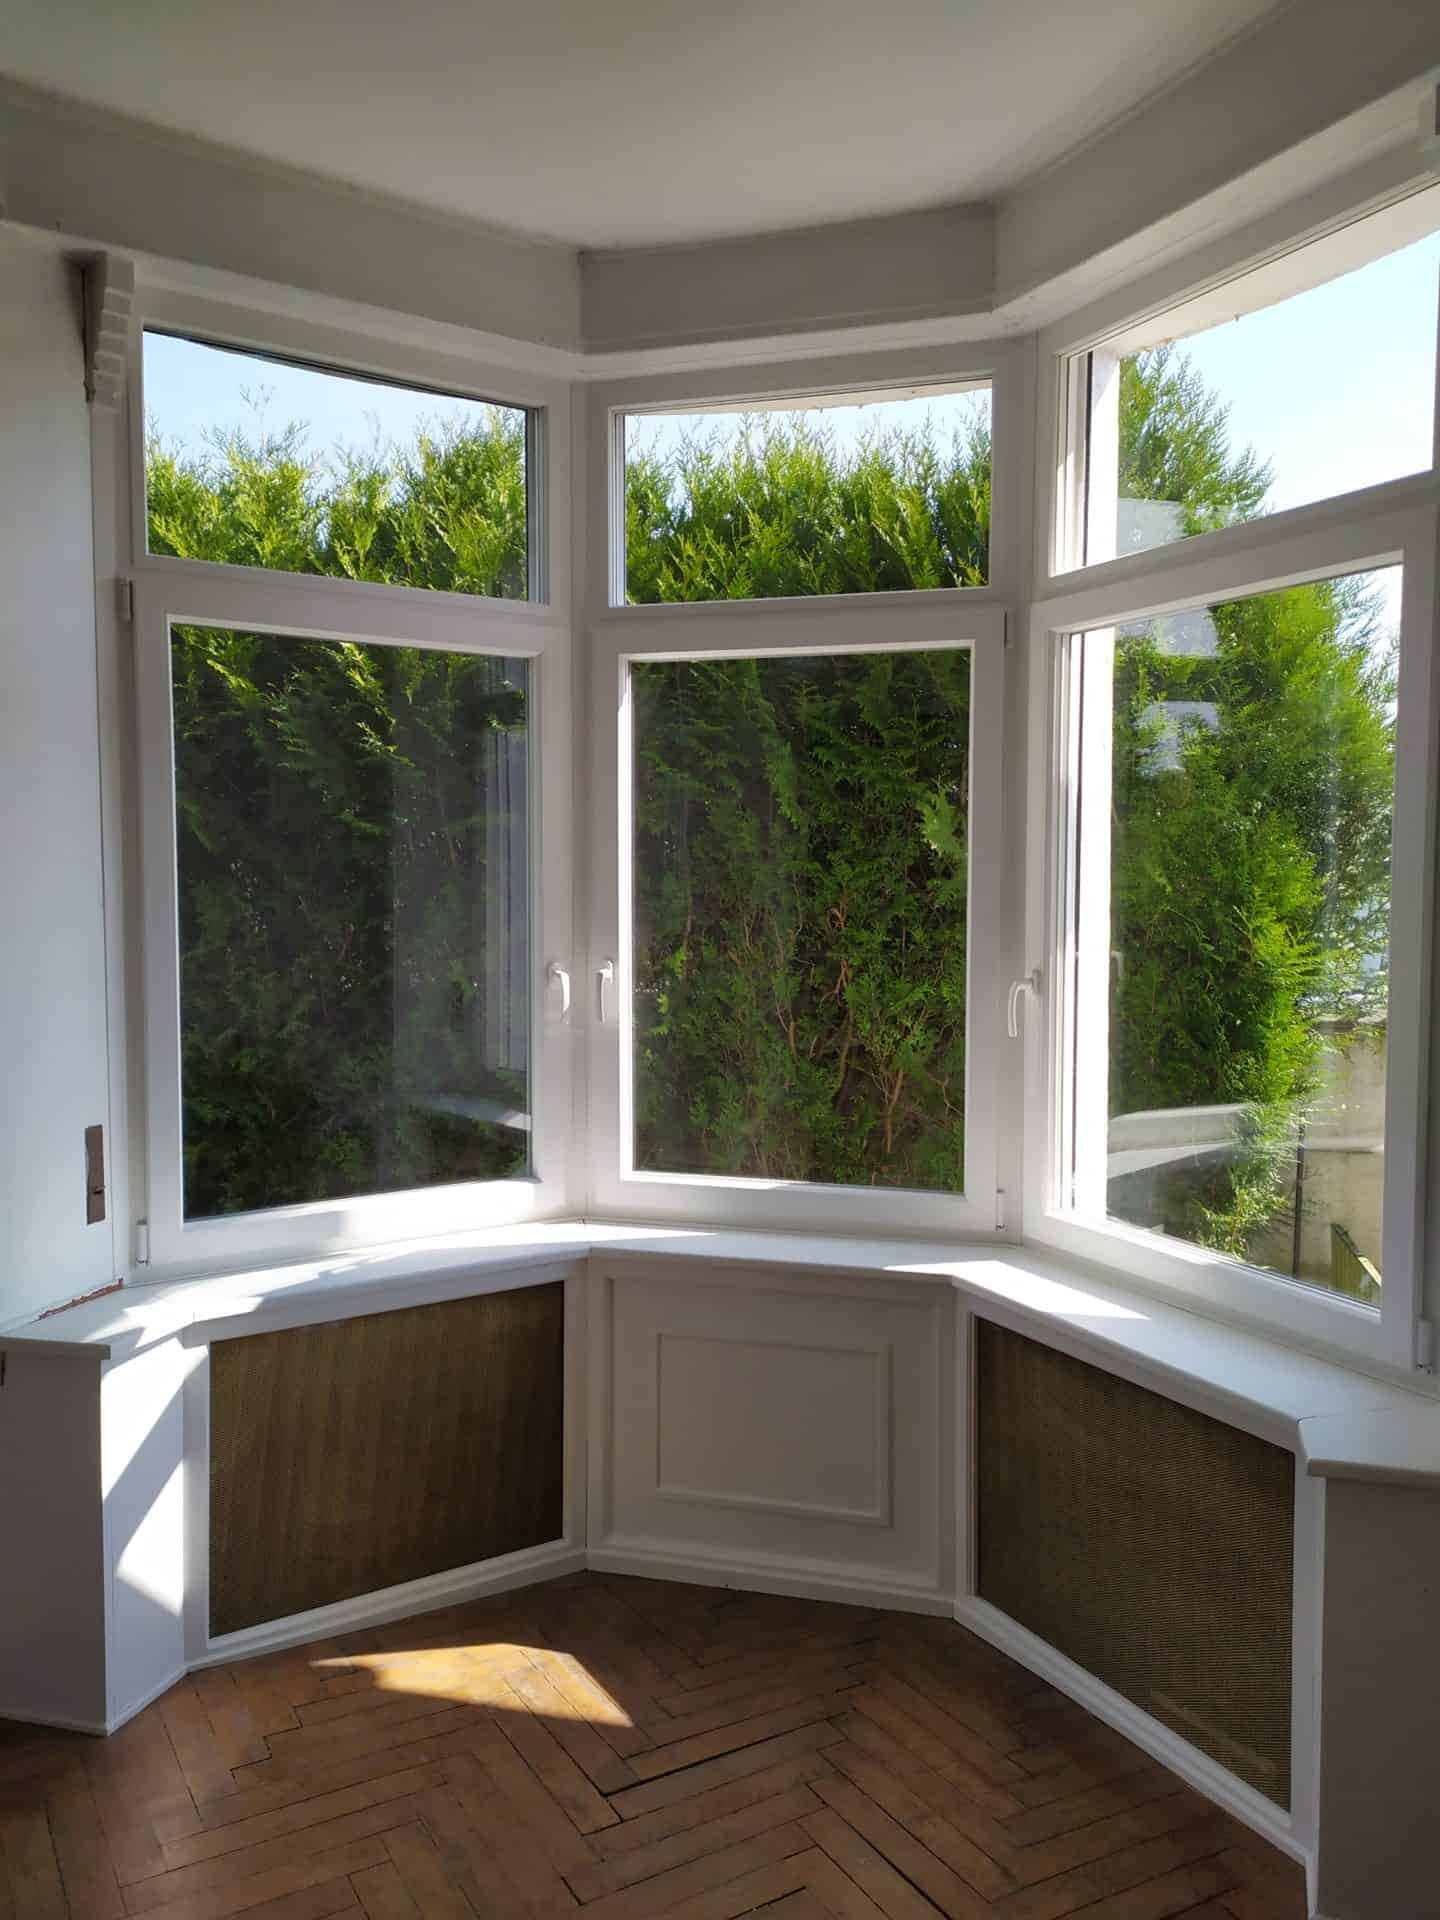 Pose de fenêtres véranda